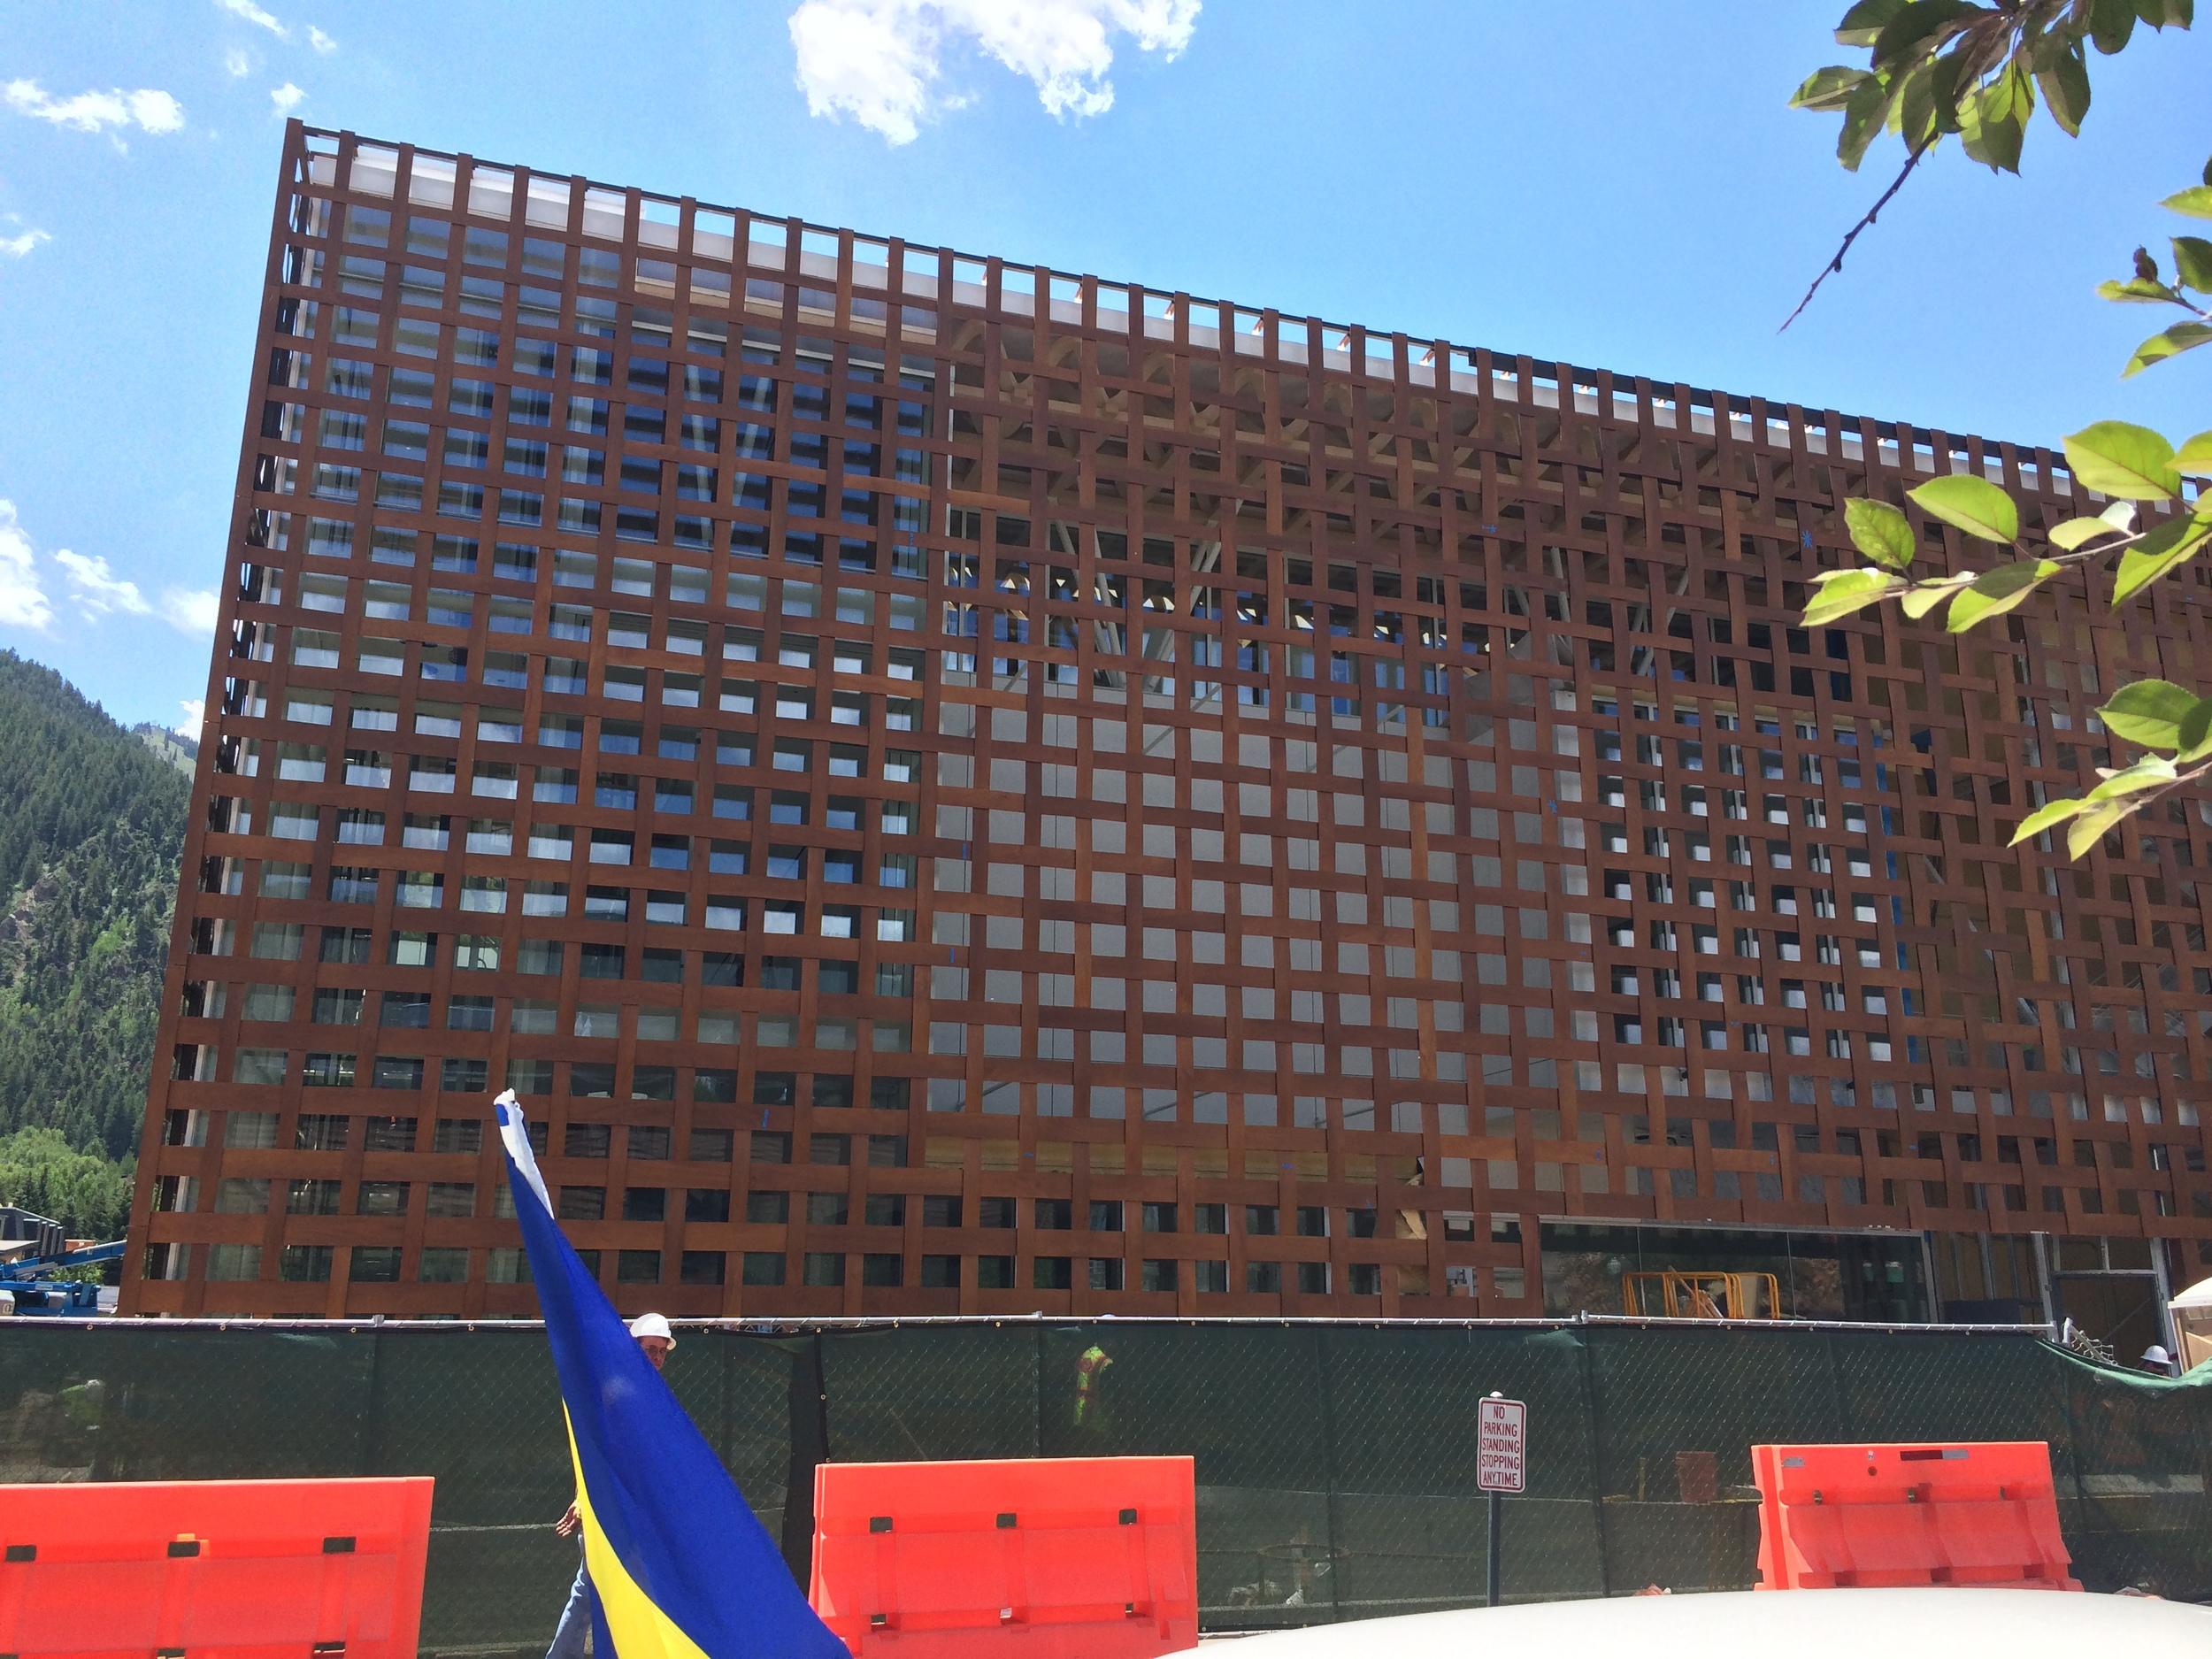 New Art Museum with woven wooden facade, Aspen, CO